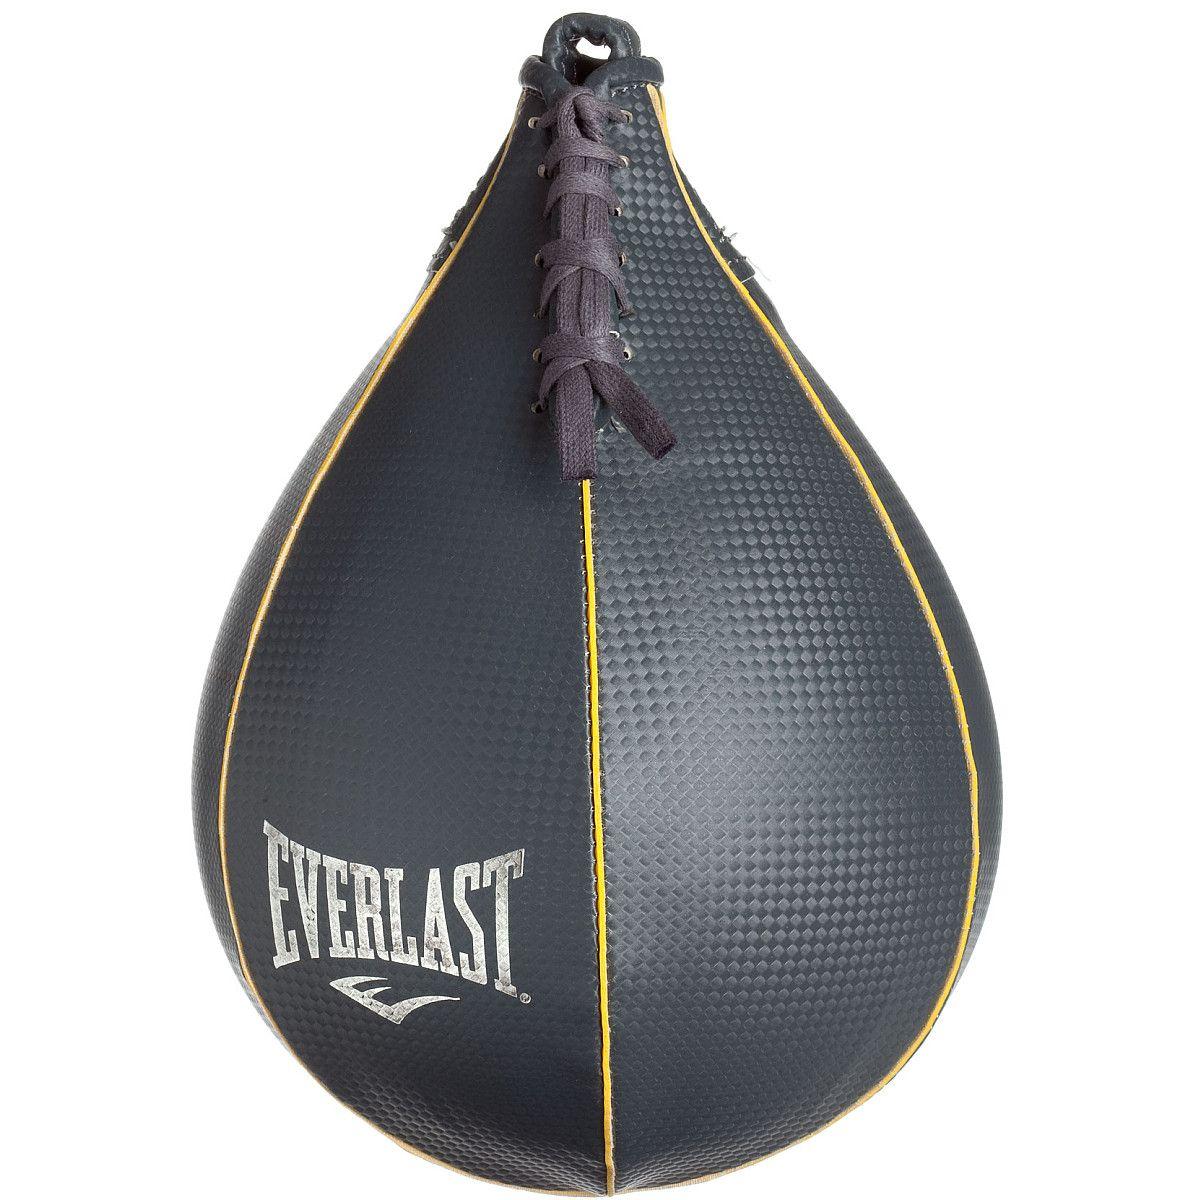 Everlast Lightweight Durahide Sd Bag Sportsauthority